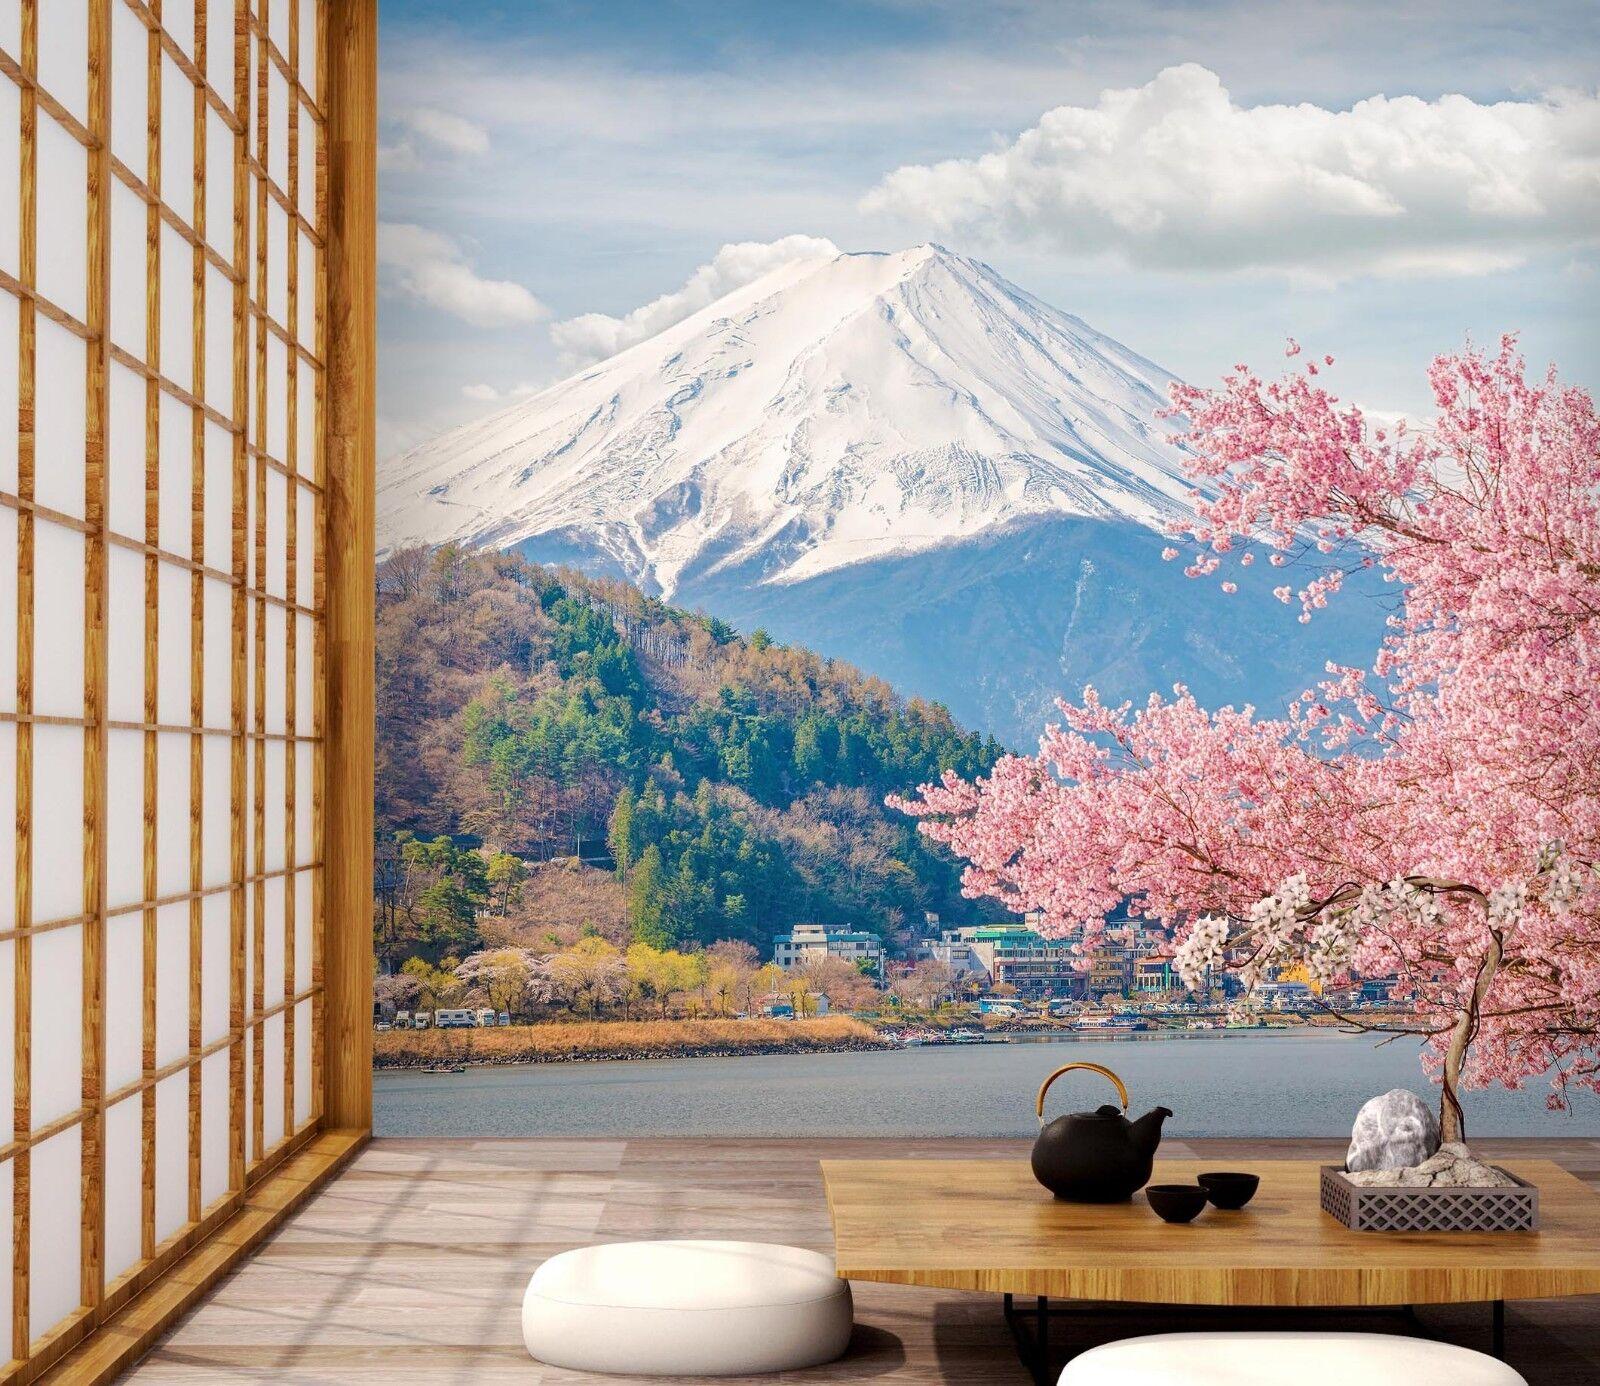 3D Mount Fuji Scenery 45 Wall Paper Wall Print Decal Deco Indoor Wall Mural CA